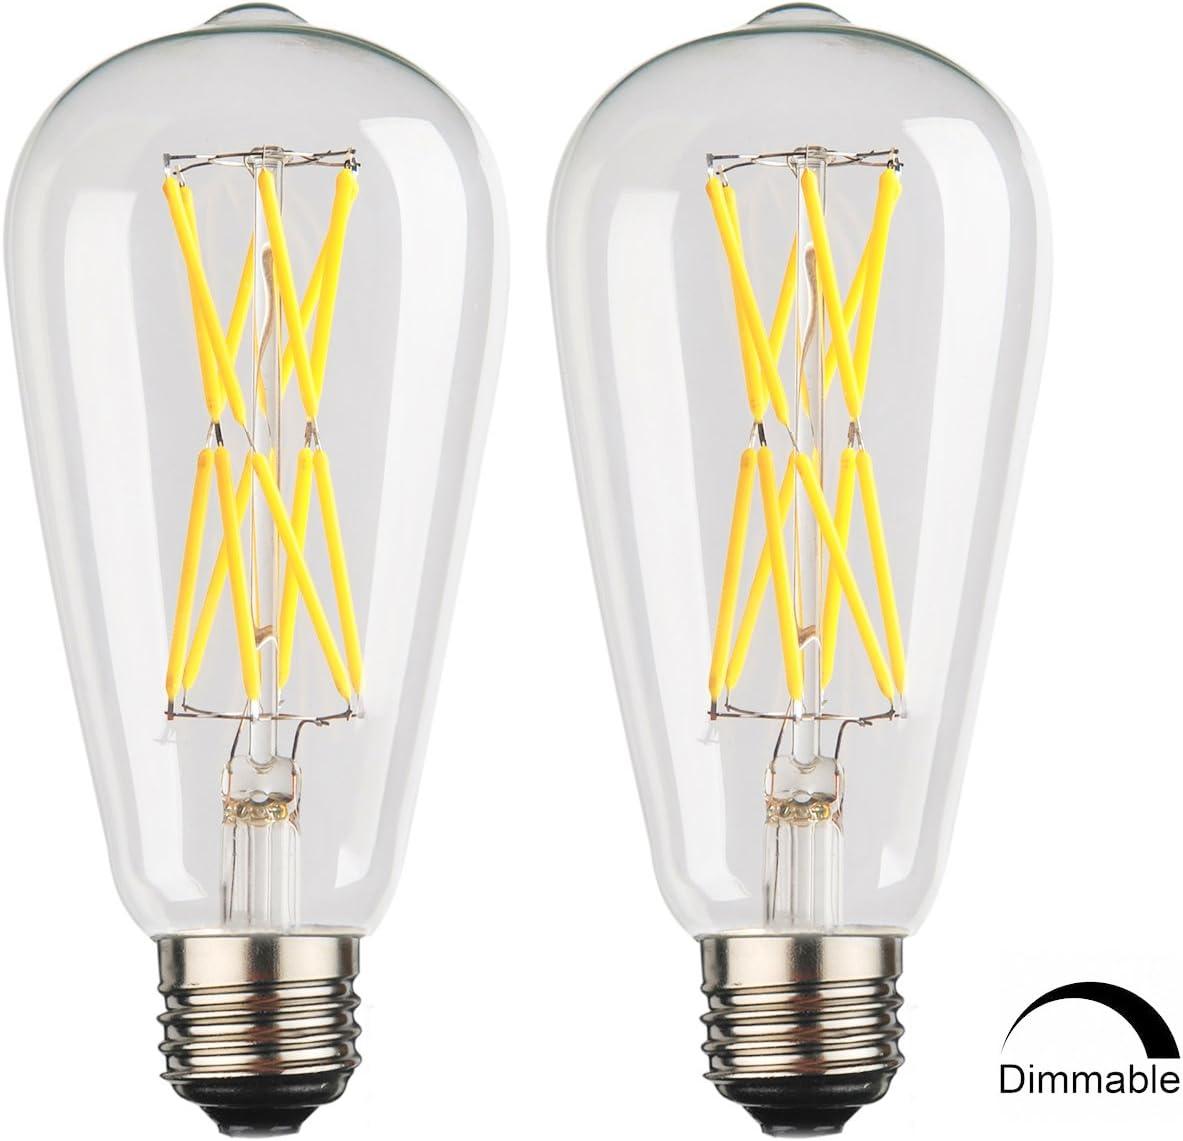 Amber Gold Glass LEOOLS 12W Vintage LED Edison Bulb Dimmable,100 Watt Incandescent Equivalent 2500K Warm White 2-Pack E26 Base Squarrel Cage Filament Vintage Light Bulb Decorative Antique Shape